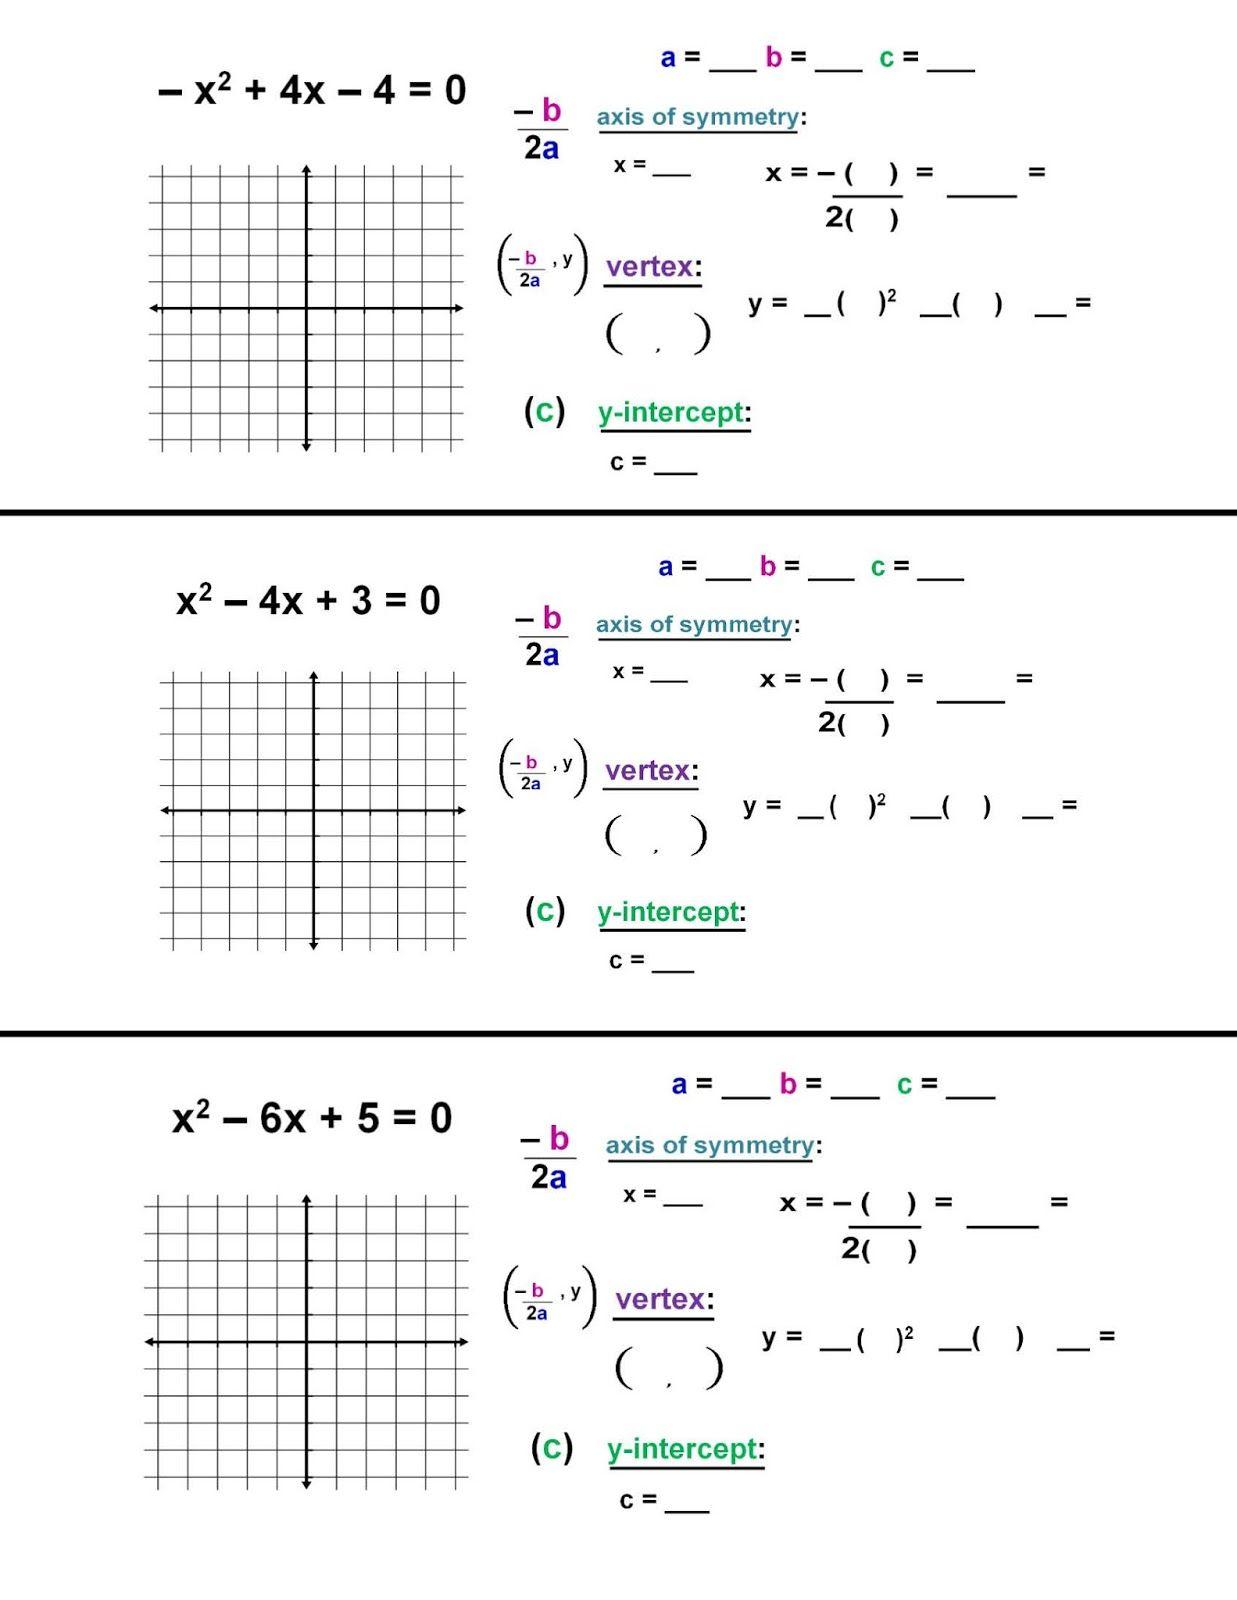 Algebra resources my quadratic unit algebra pinterest when i was teaching algebra my favorite unit was by far my quadratics unit o my students loved the quadratics unit too because i did falaconquin